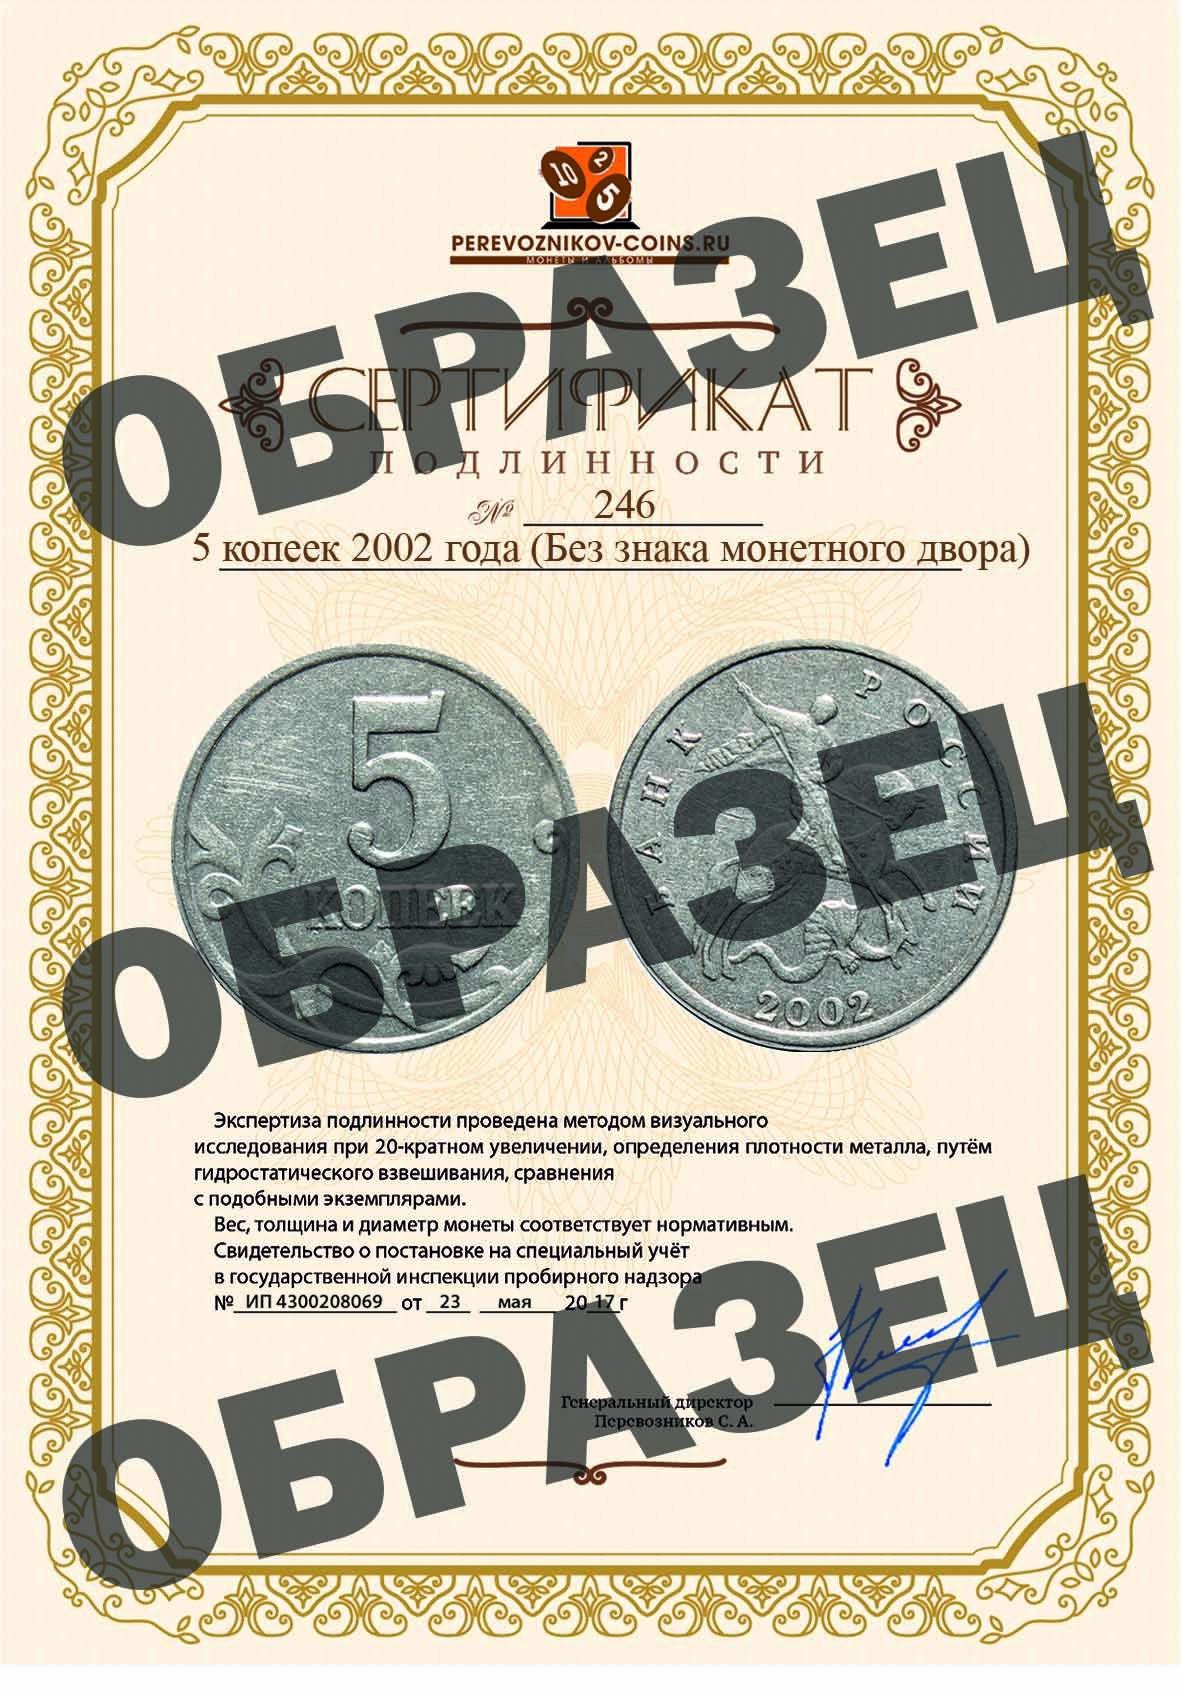 5 копеек 2002 года (Без знака монетного двора) XF